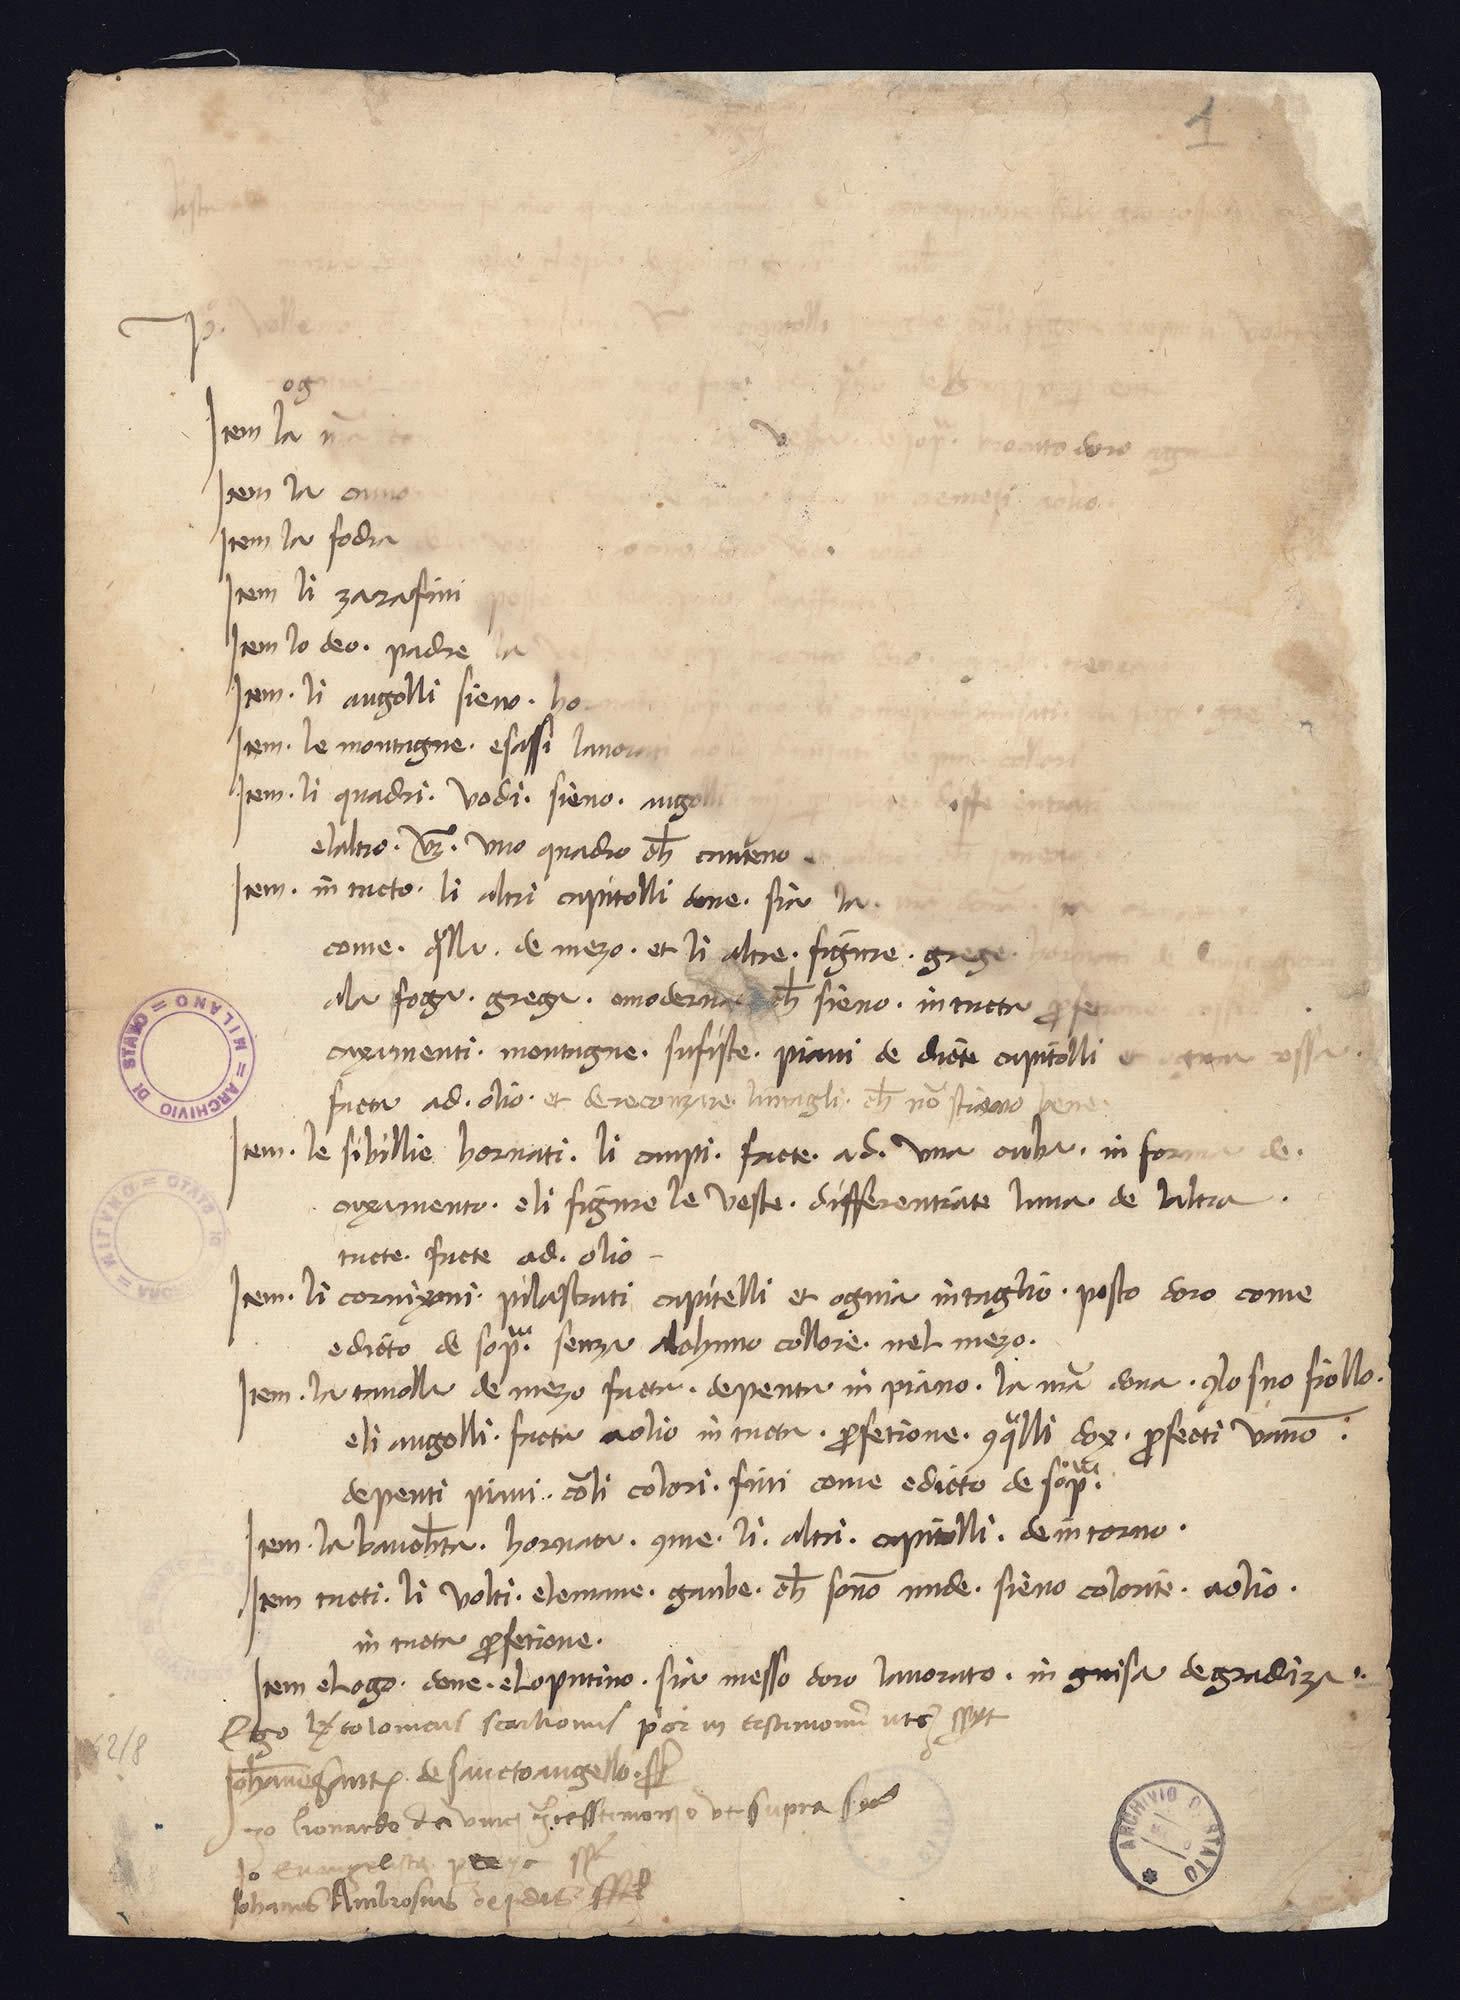 "Sarà sottoposta a restauro ""digitale"" l'unica firma conosciuta di Leonardo da Vinci"